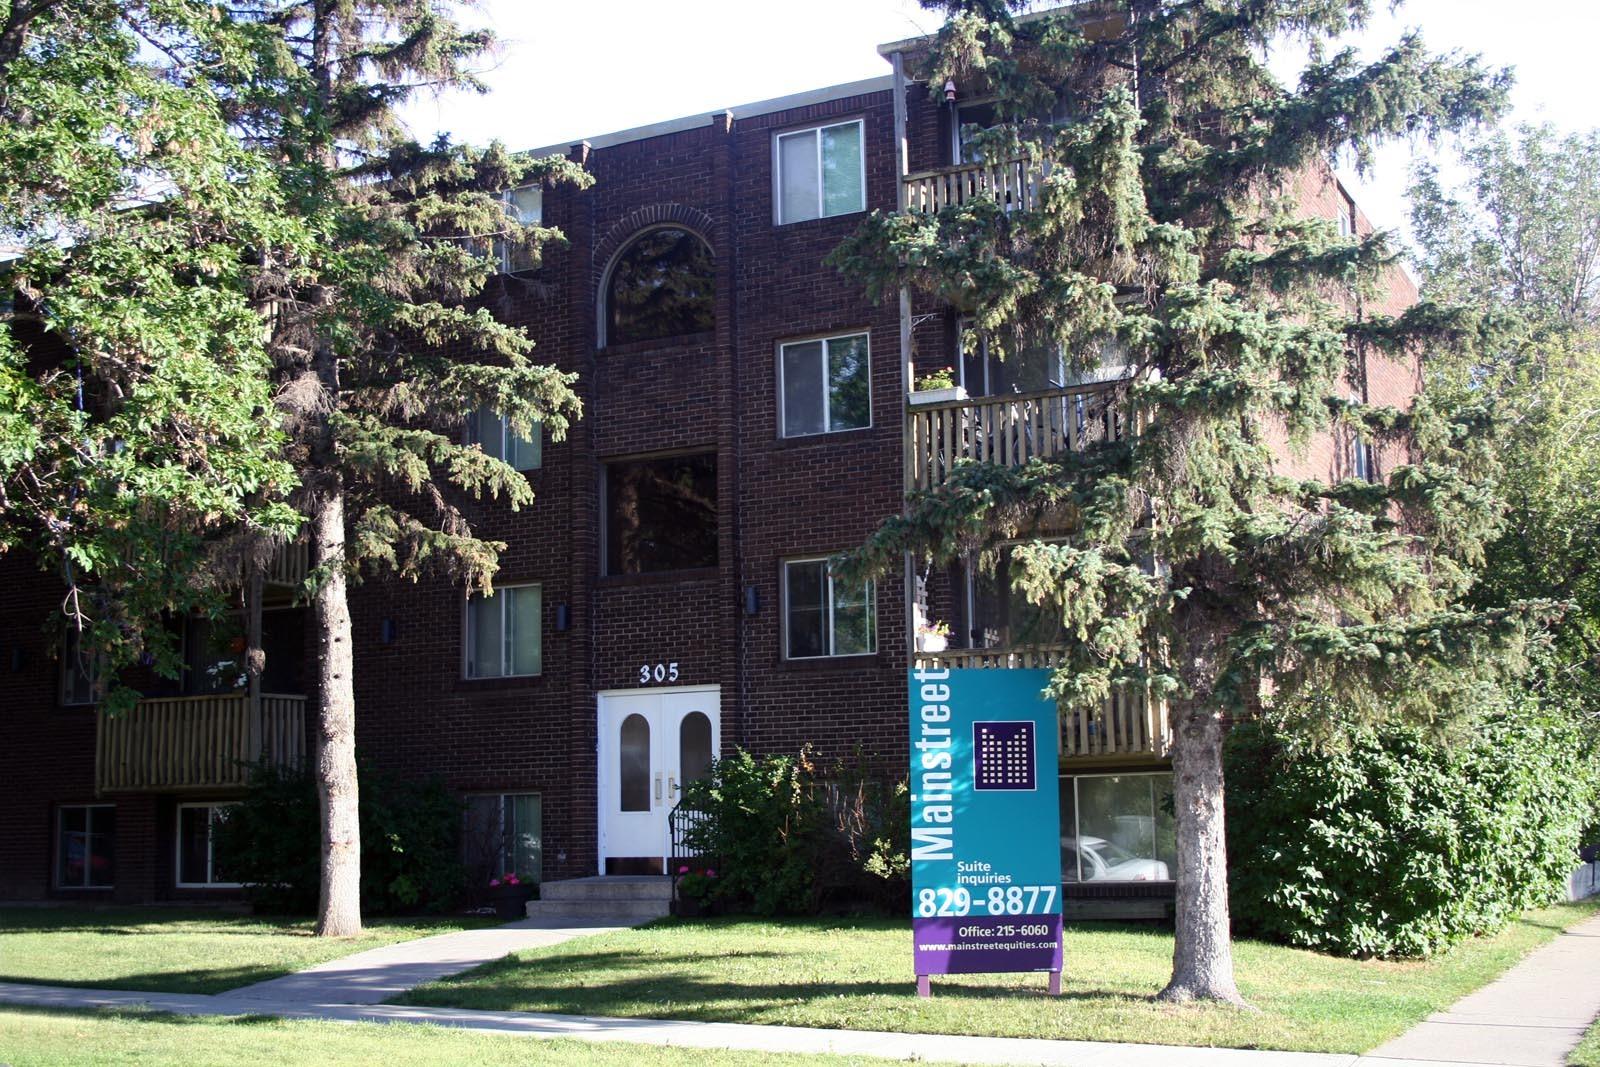 305 13 Avenue NE, Calgary, AB - $1,325